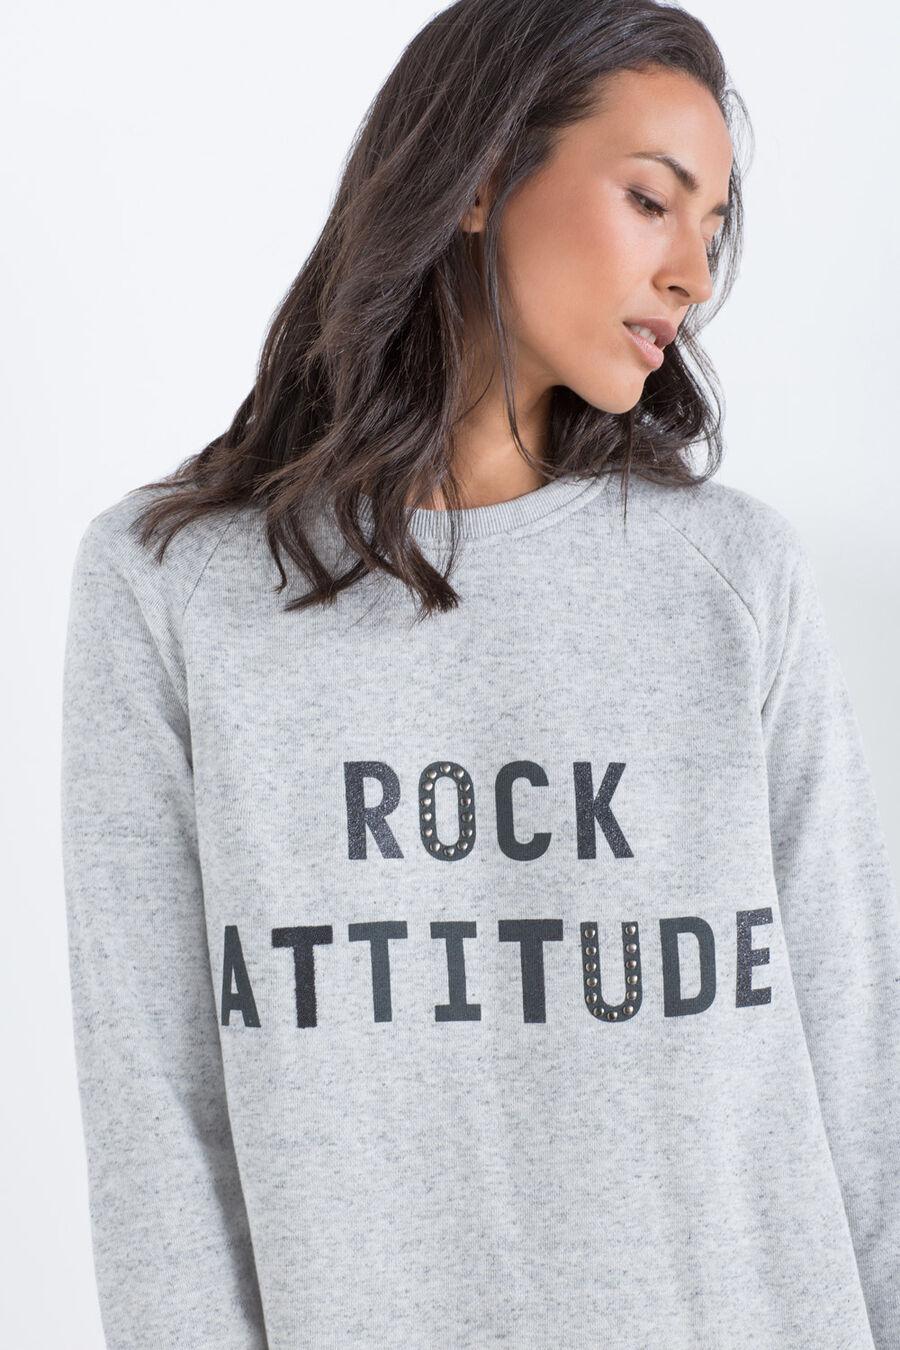 Rock attitude' sweatdress